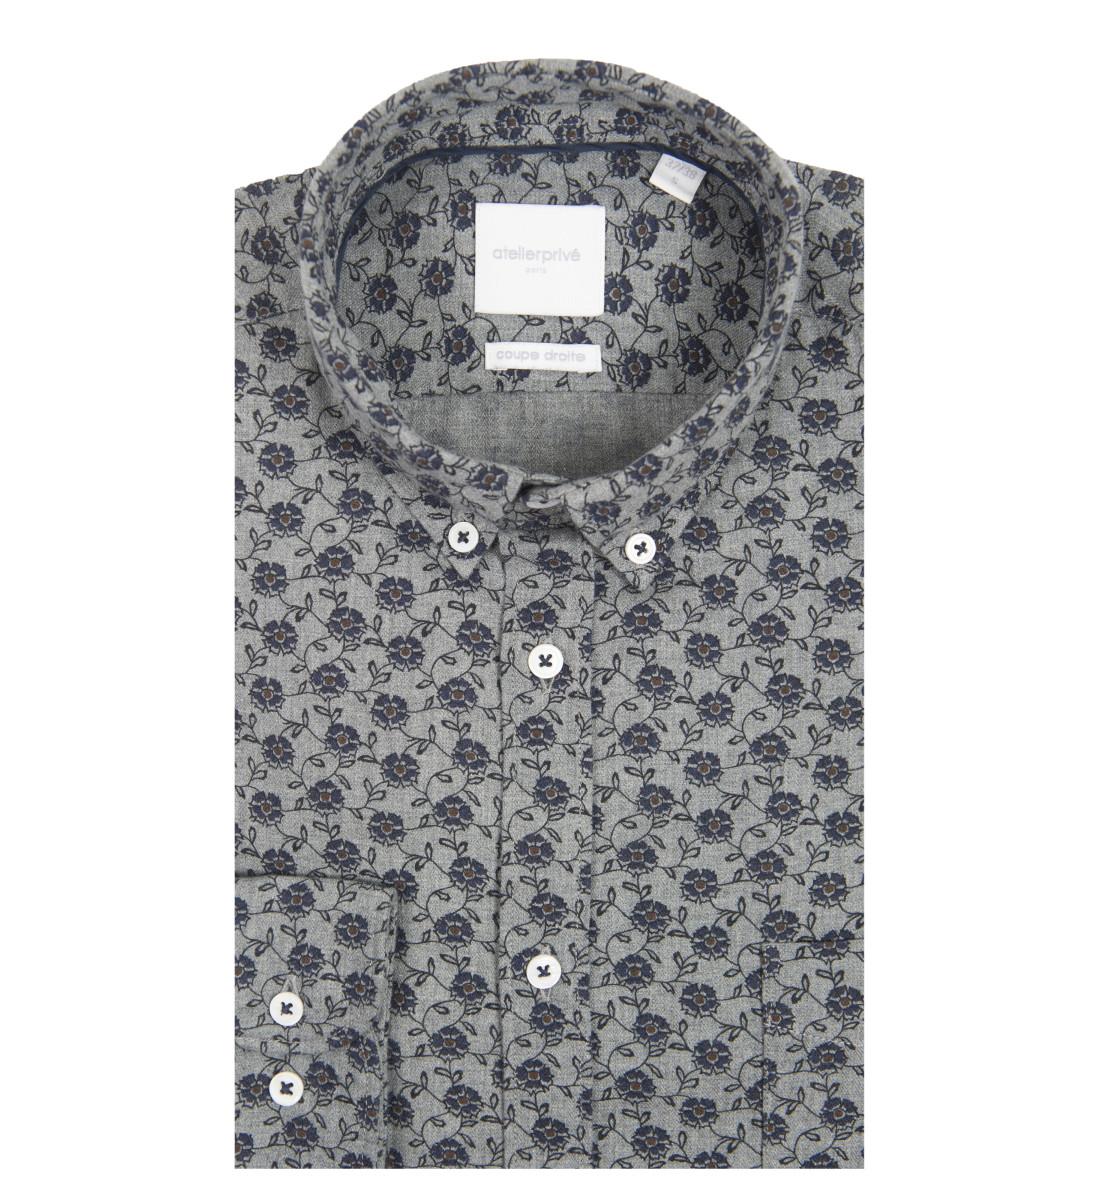 Chemise coupe droite Oscar